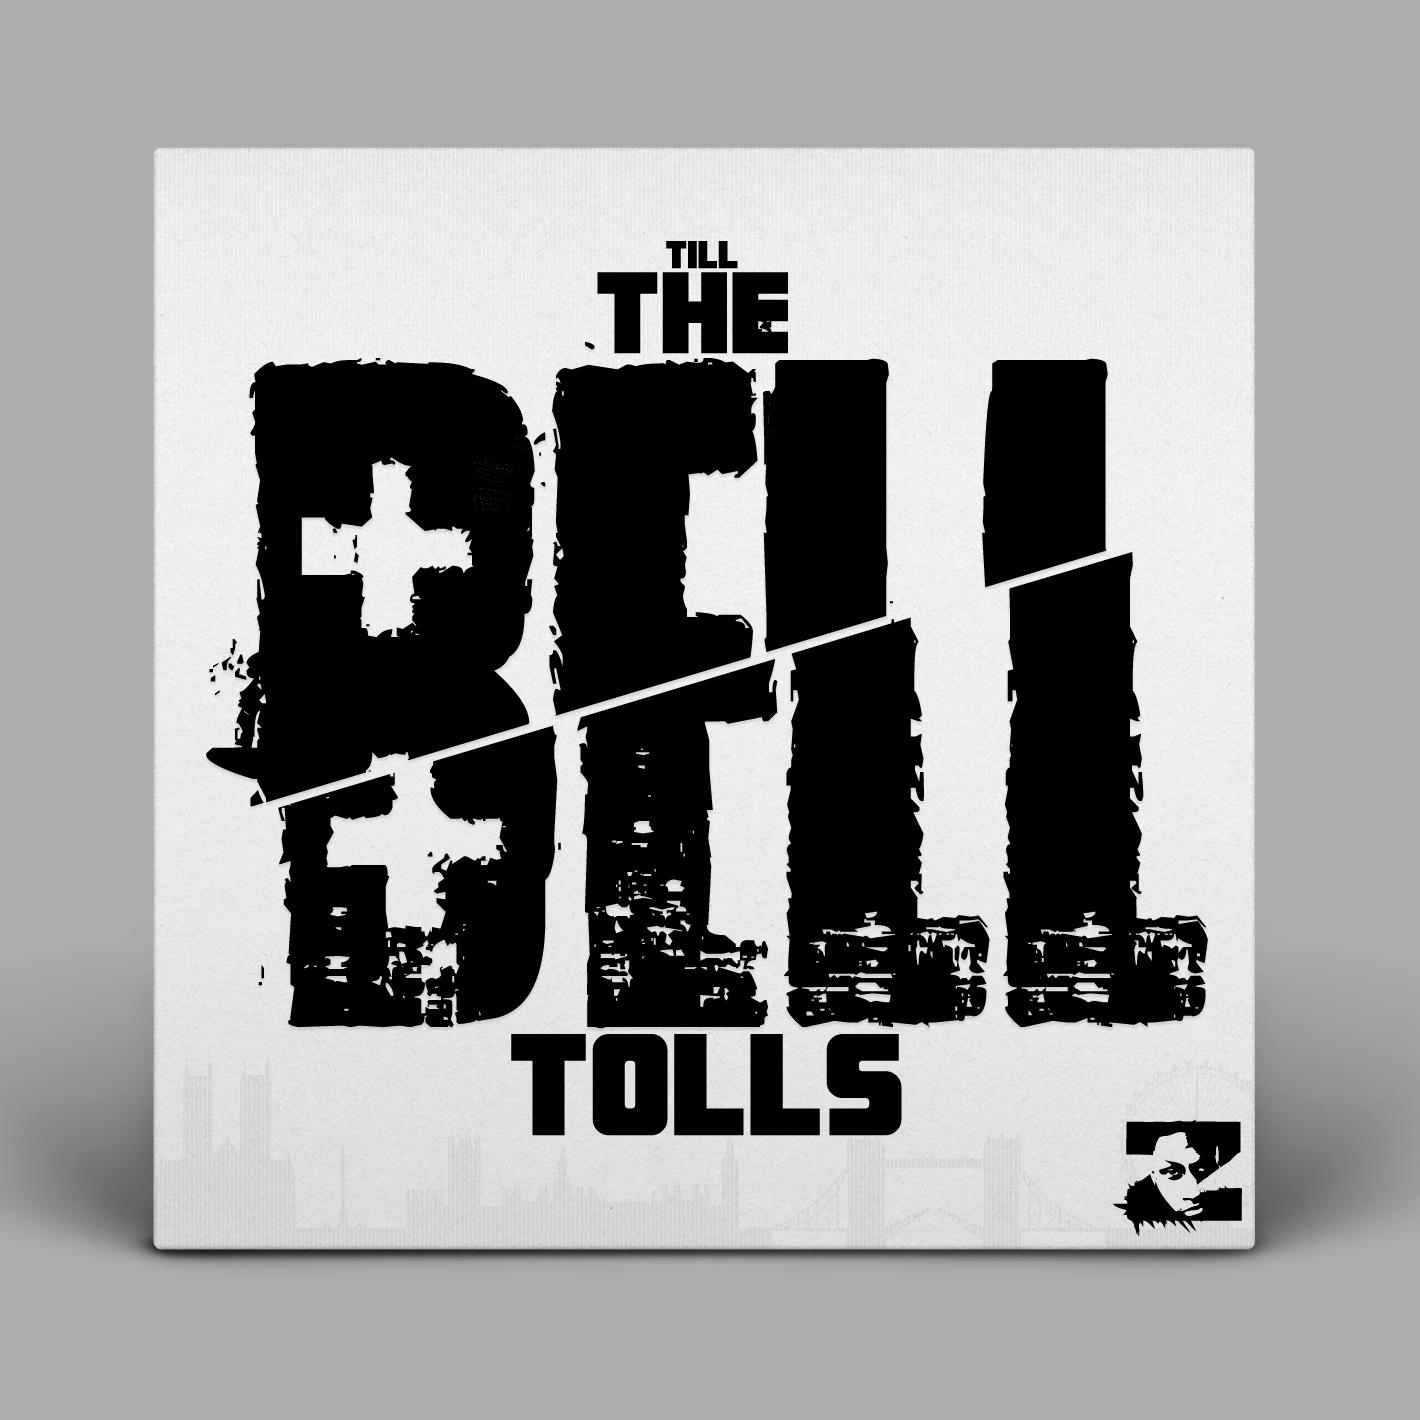 'Till The Bell Tolls | CD Cover